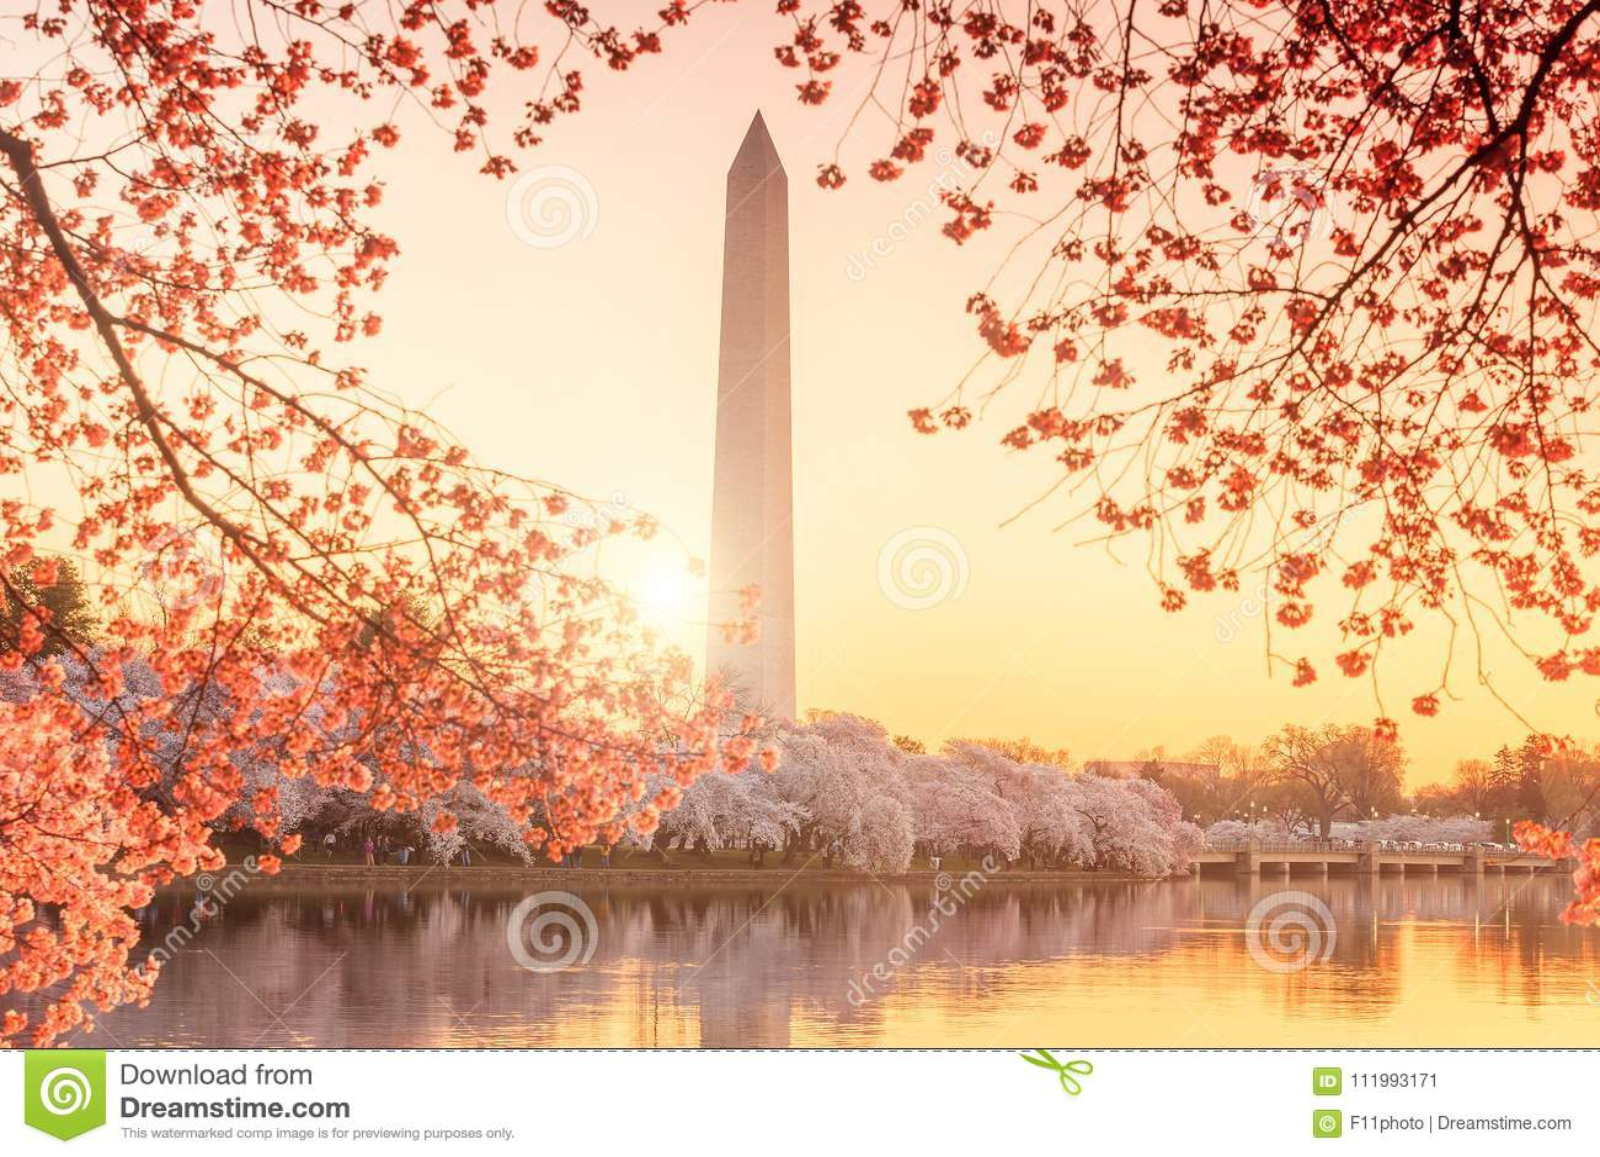 Washington Monument under Cherry Blossom Festival